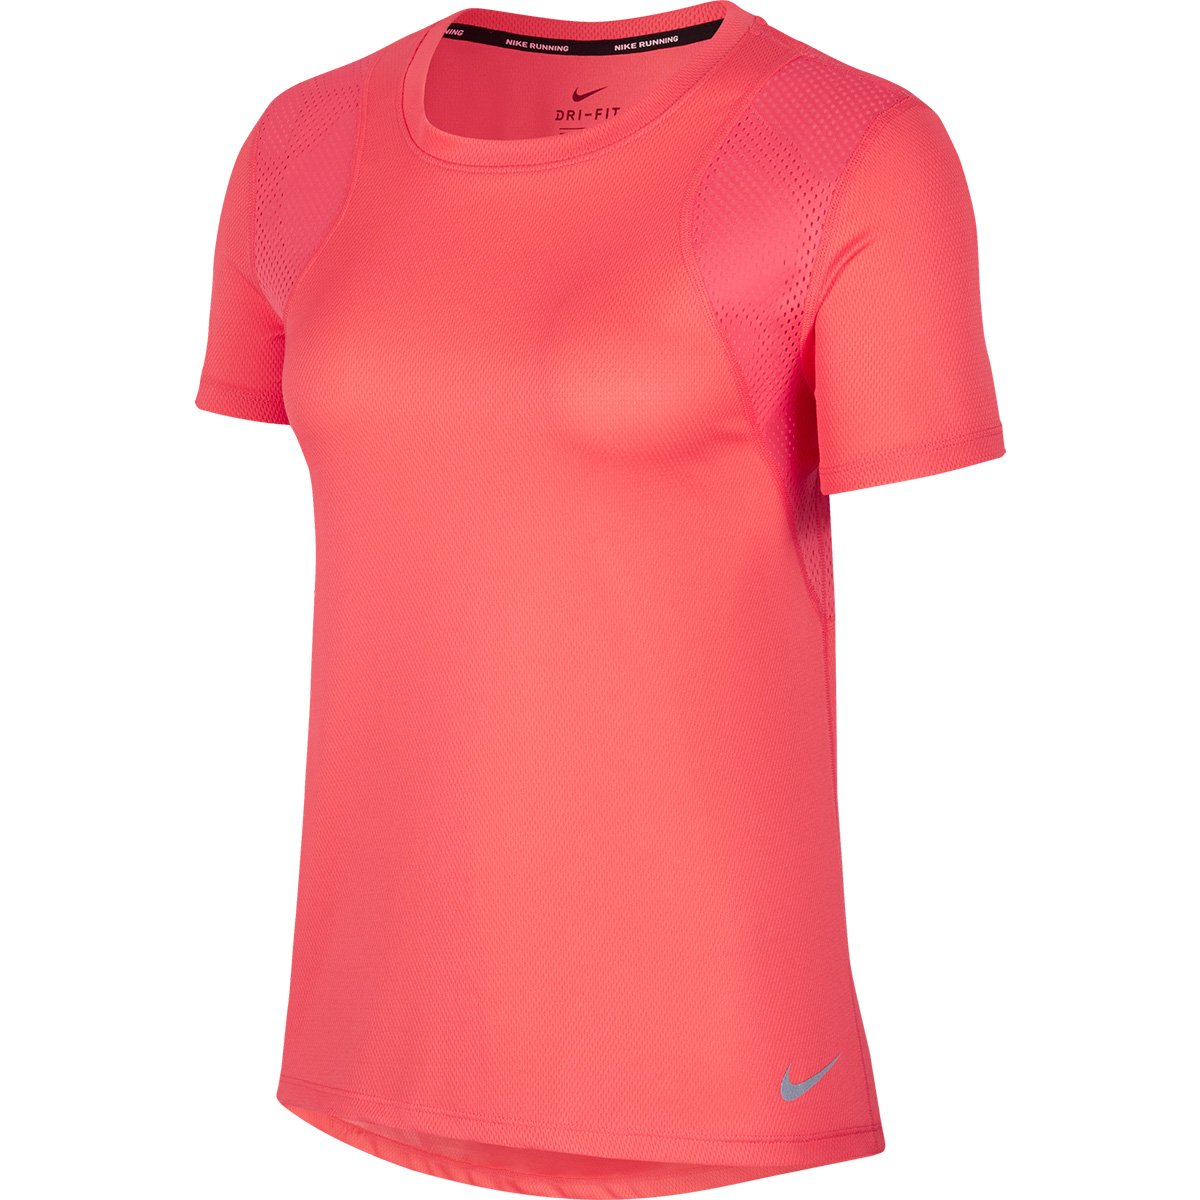 a996d38835dc3 Camiseta Nike Run Ss Feminina - Pink - Compre Agora